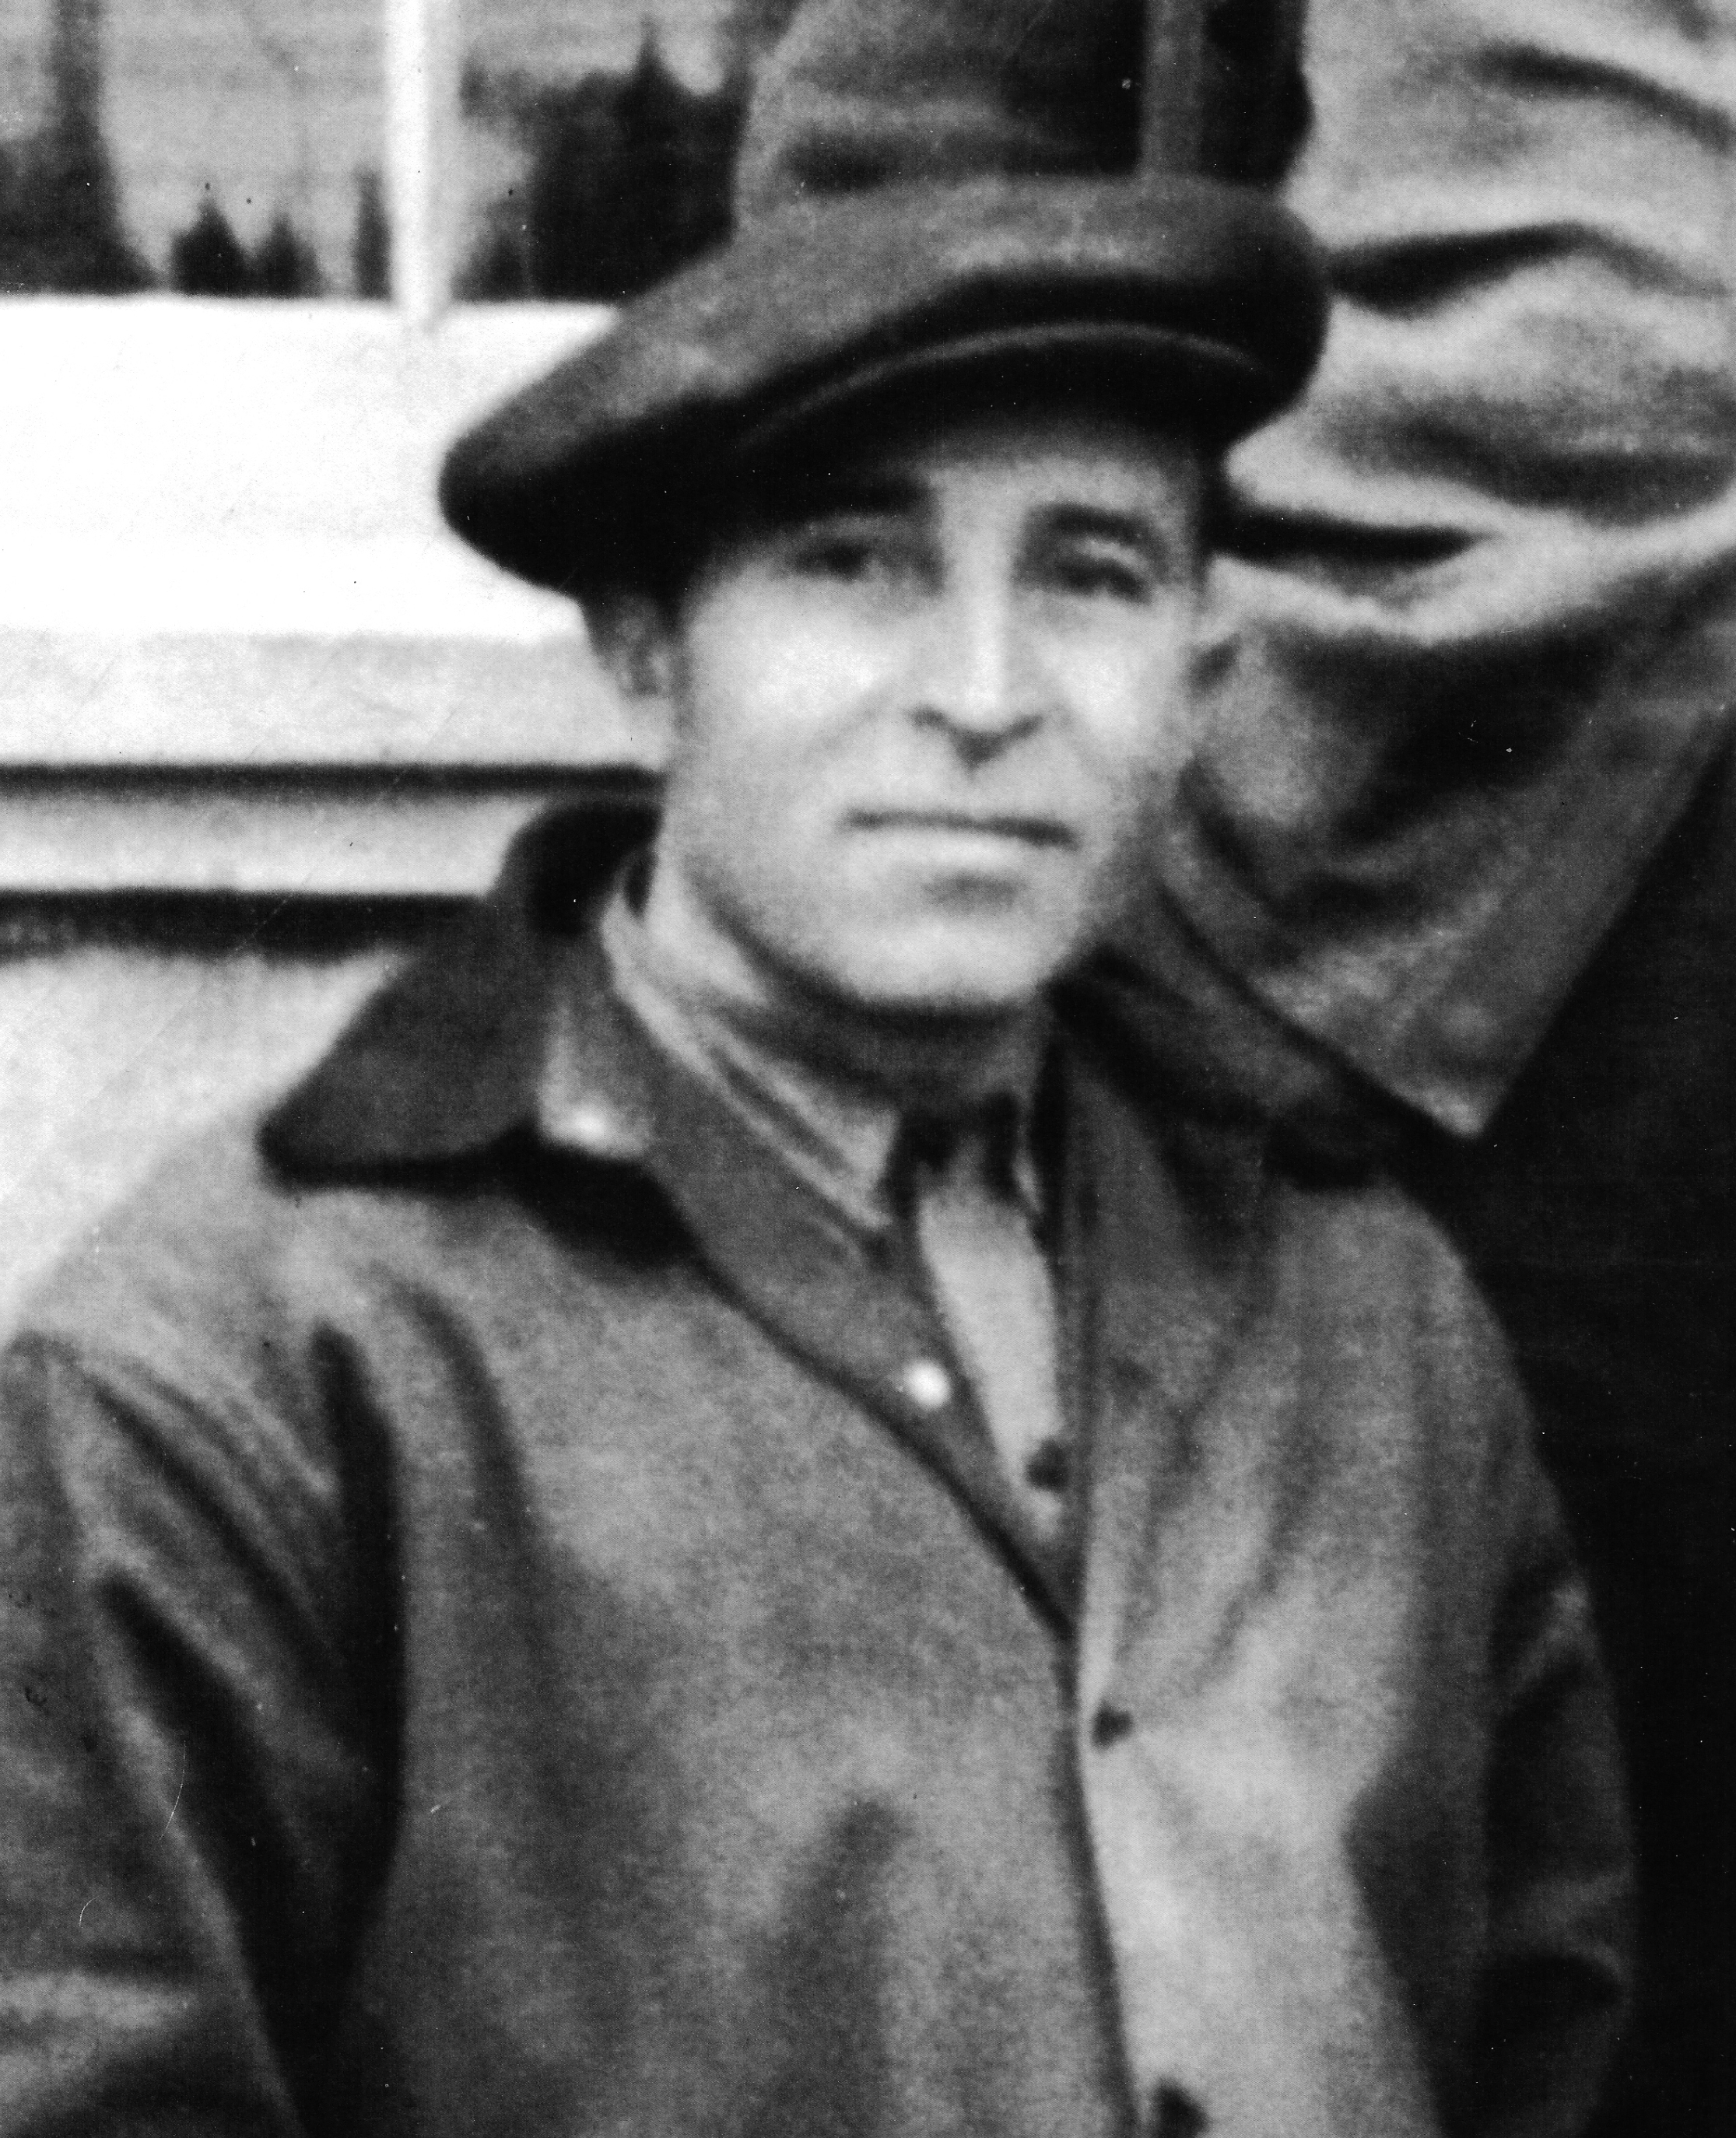 Nicola Doganieri in 1943, during his internment at Camp 70 in Fredericton. (Pillarella Collection)